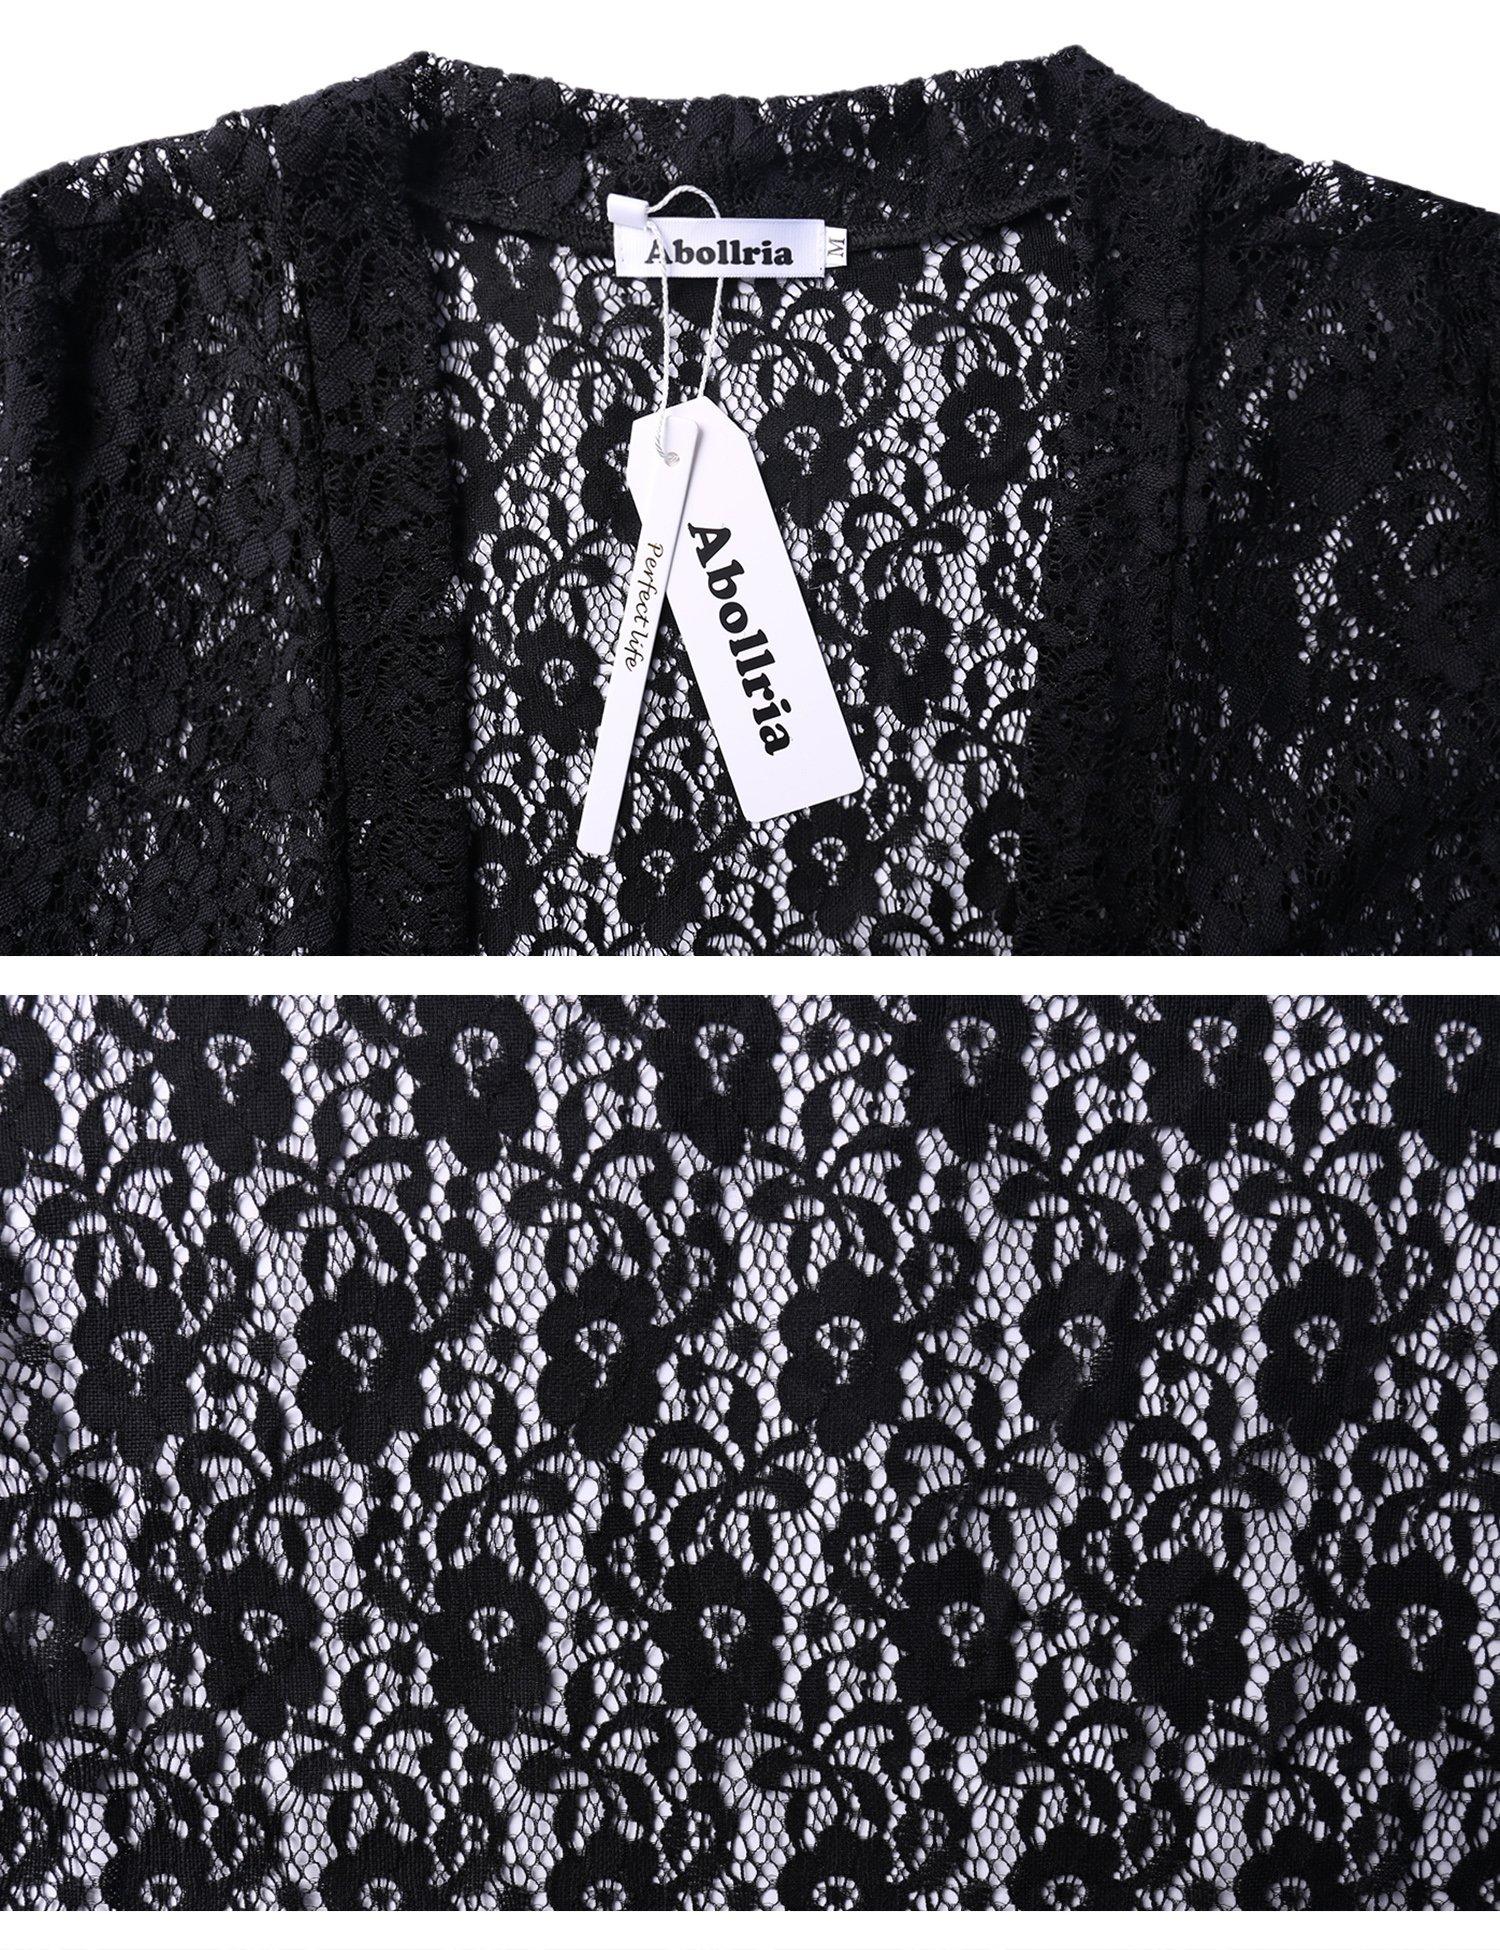 Abollria Women Tie Front Floral Lace Shrug Open Front Bolero Cardigan by Abollria (Image #6)